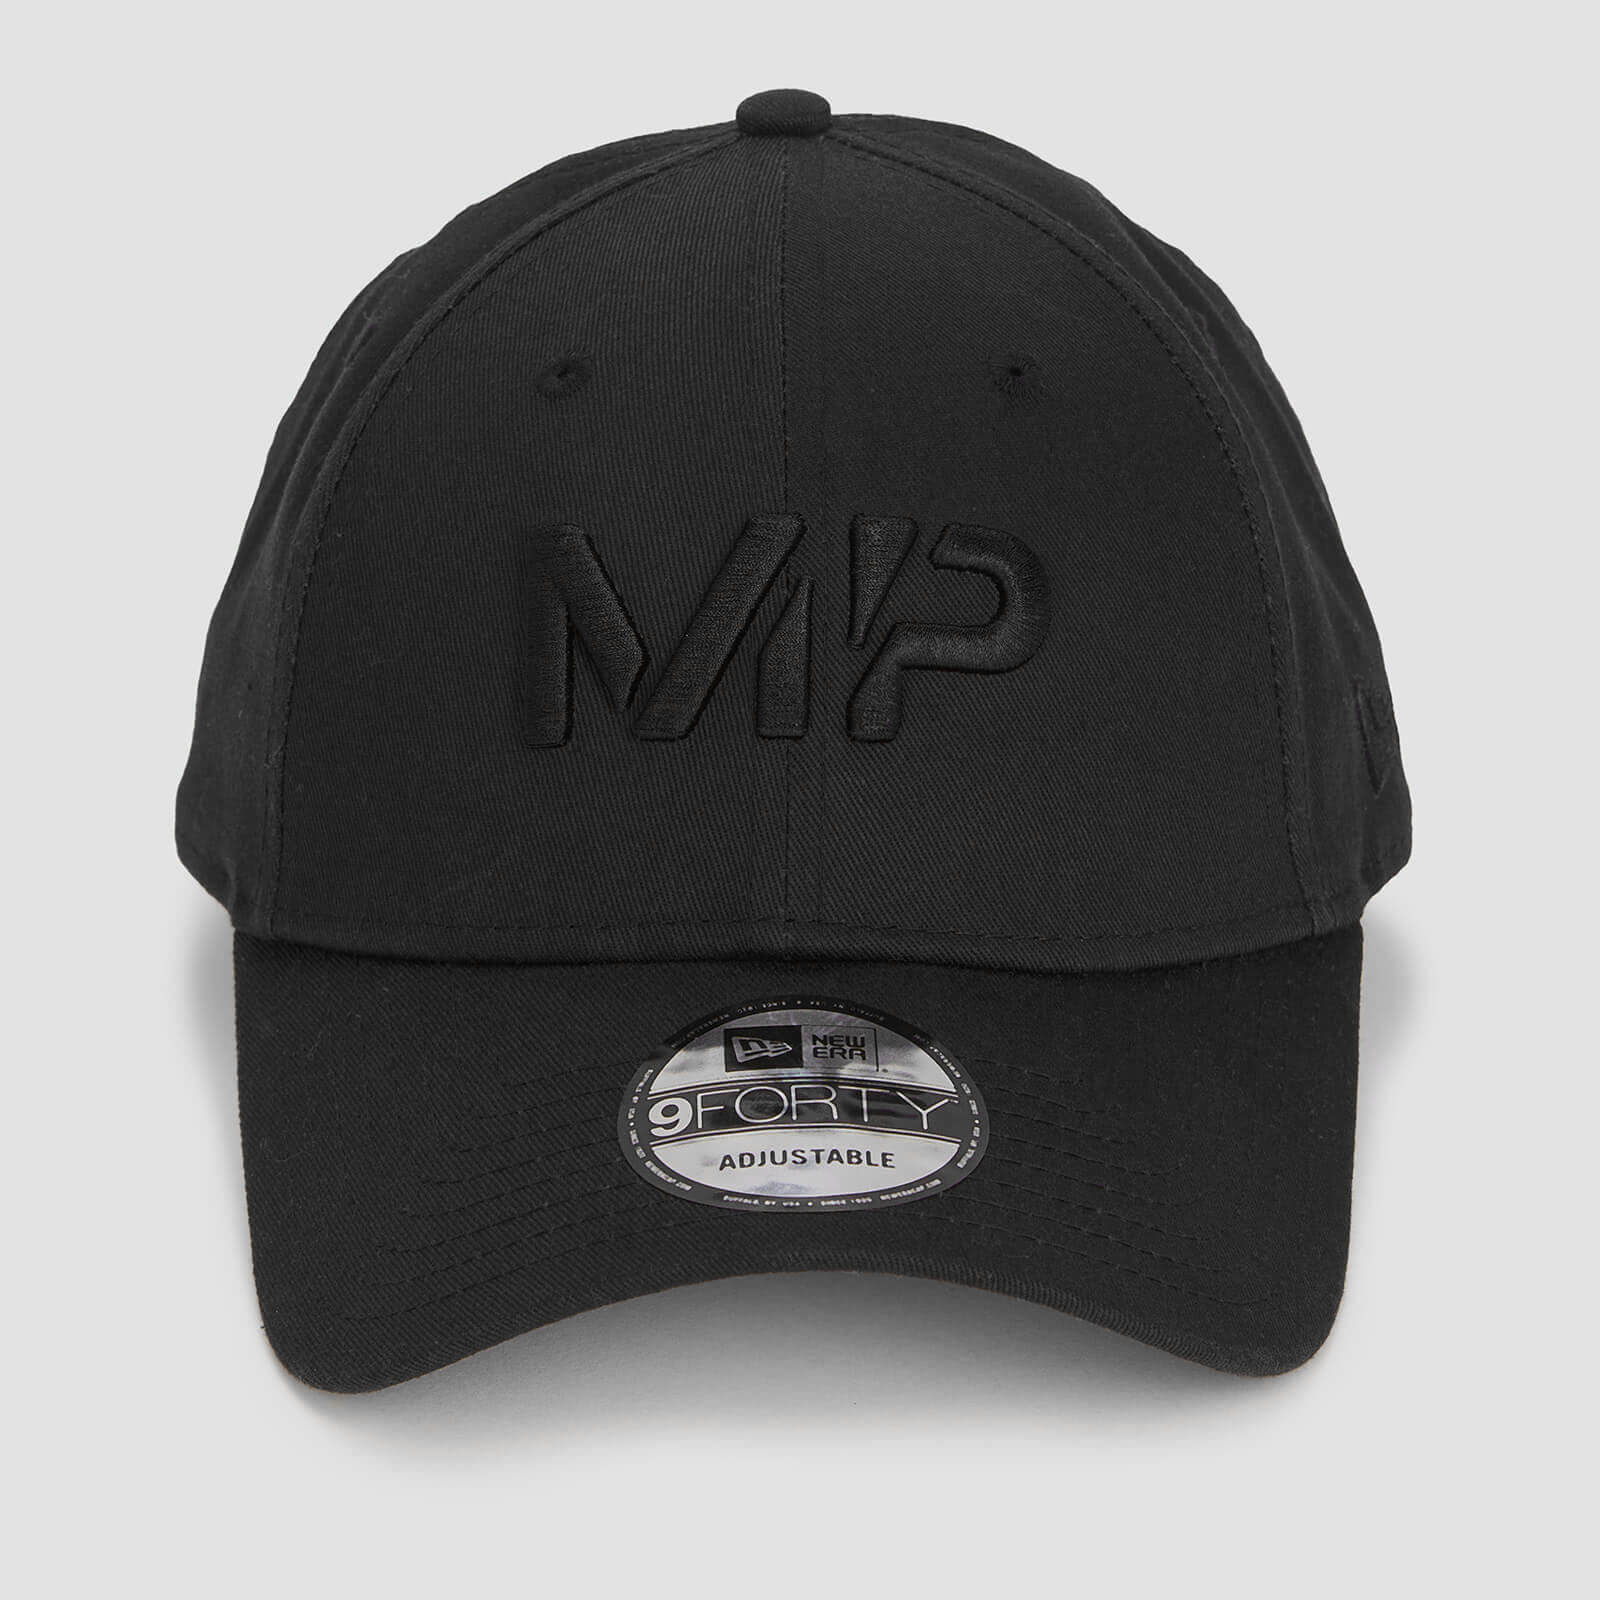 MP New Era 9FORTY Baseball Cap - Black/Black